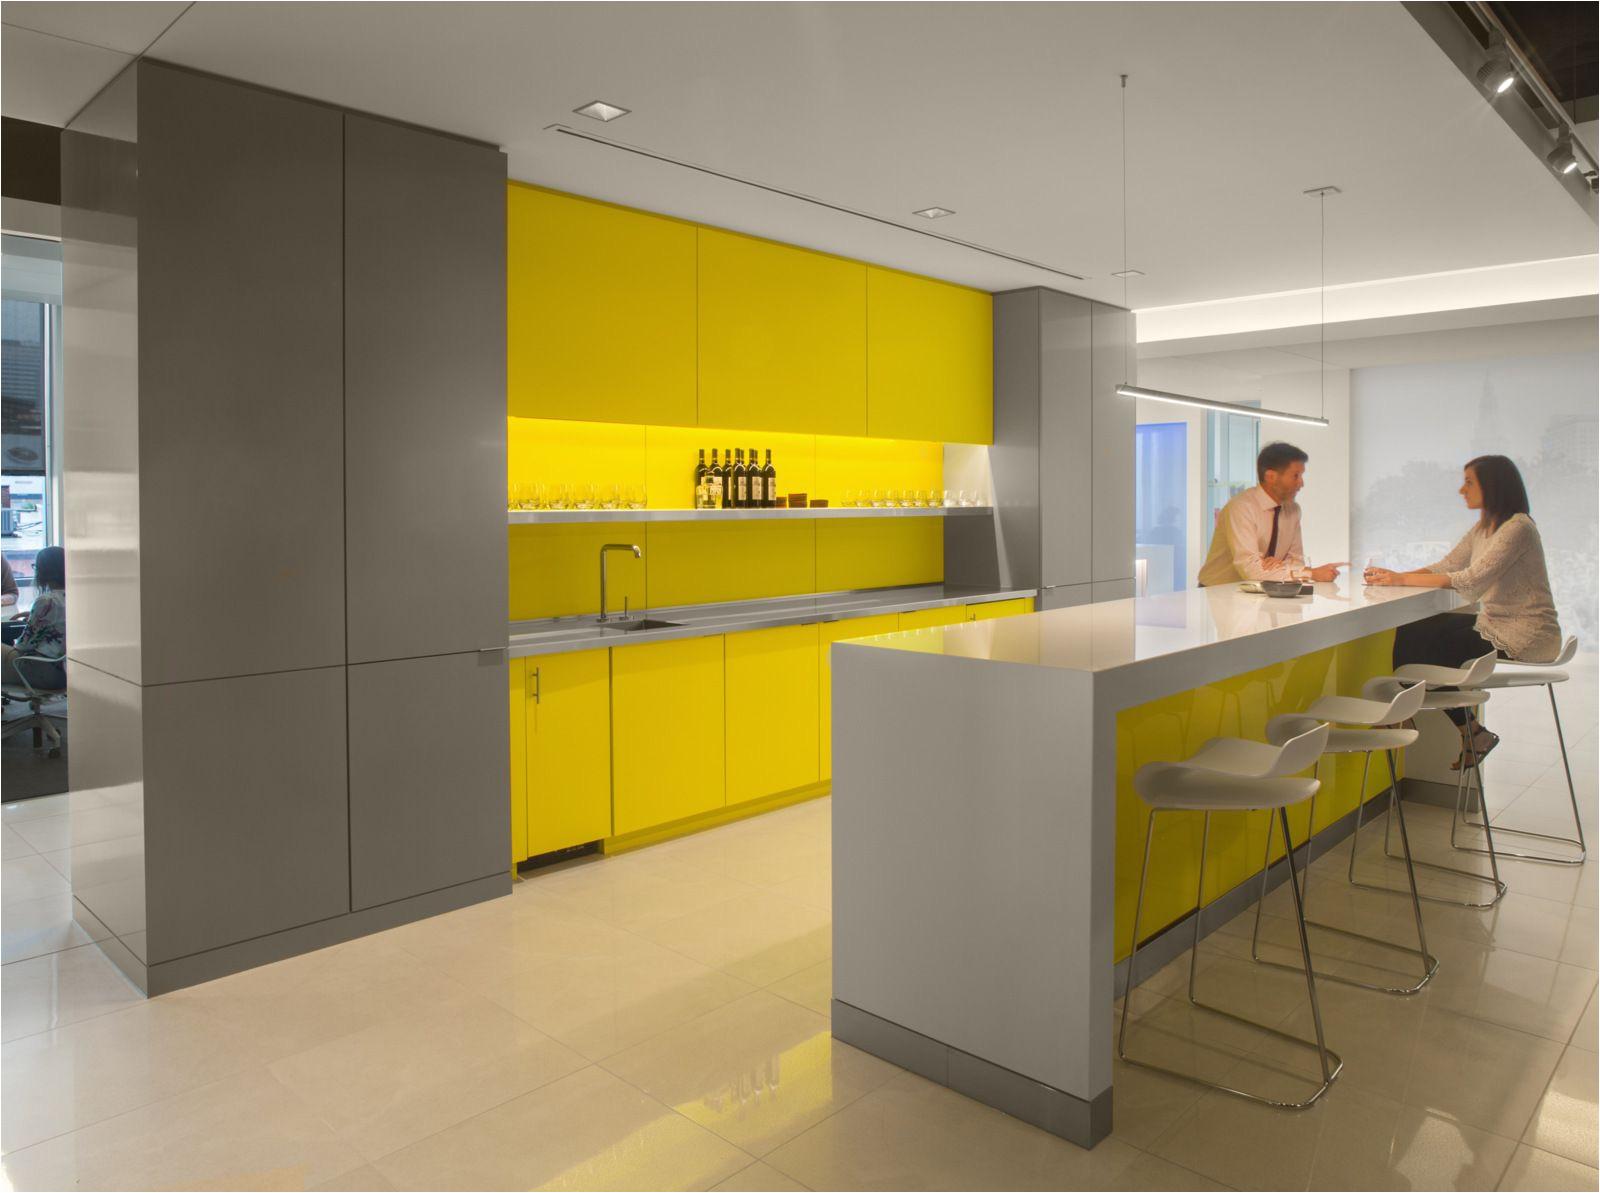 showroom cocina comedor sala reunion decoracia n de comedor cocina comedor decoracia n